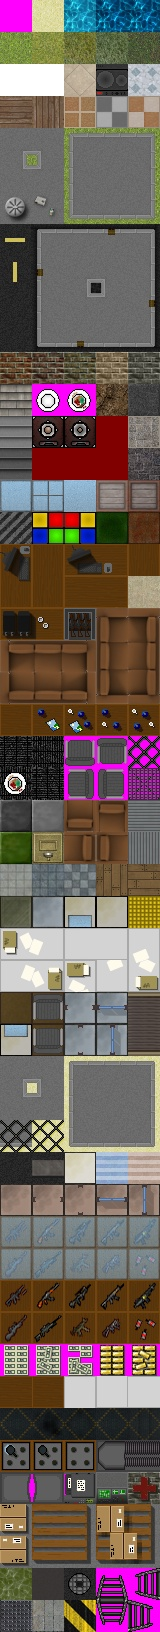 IMG:http://i34.servimg.com/u/f34/16/84/64/23/jail_t10.jpg